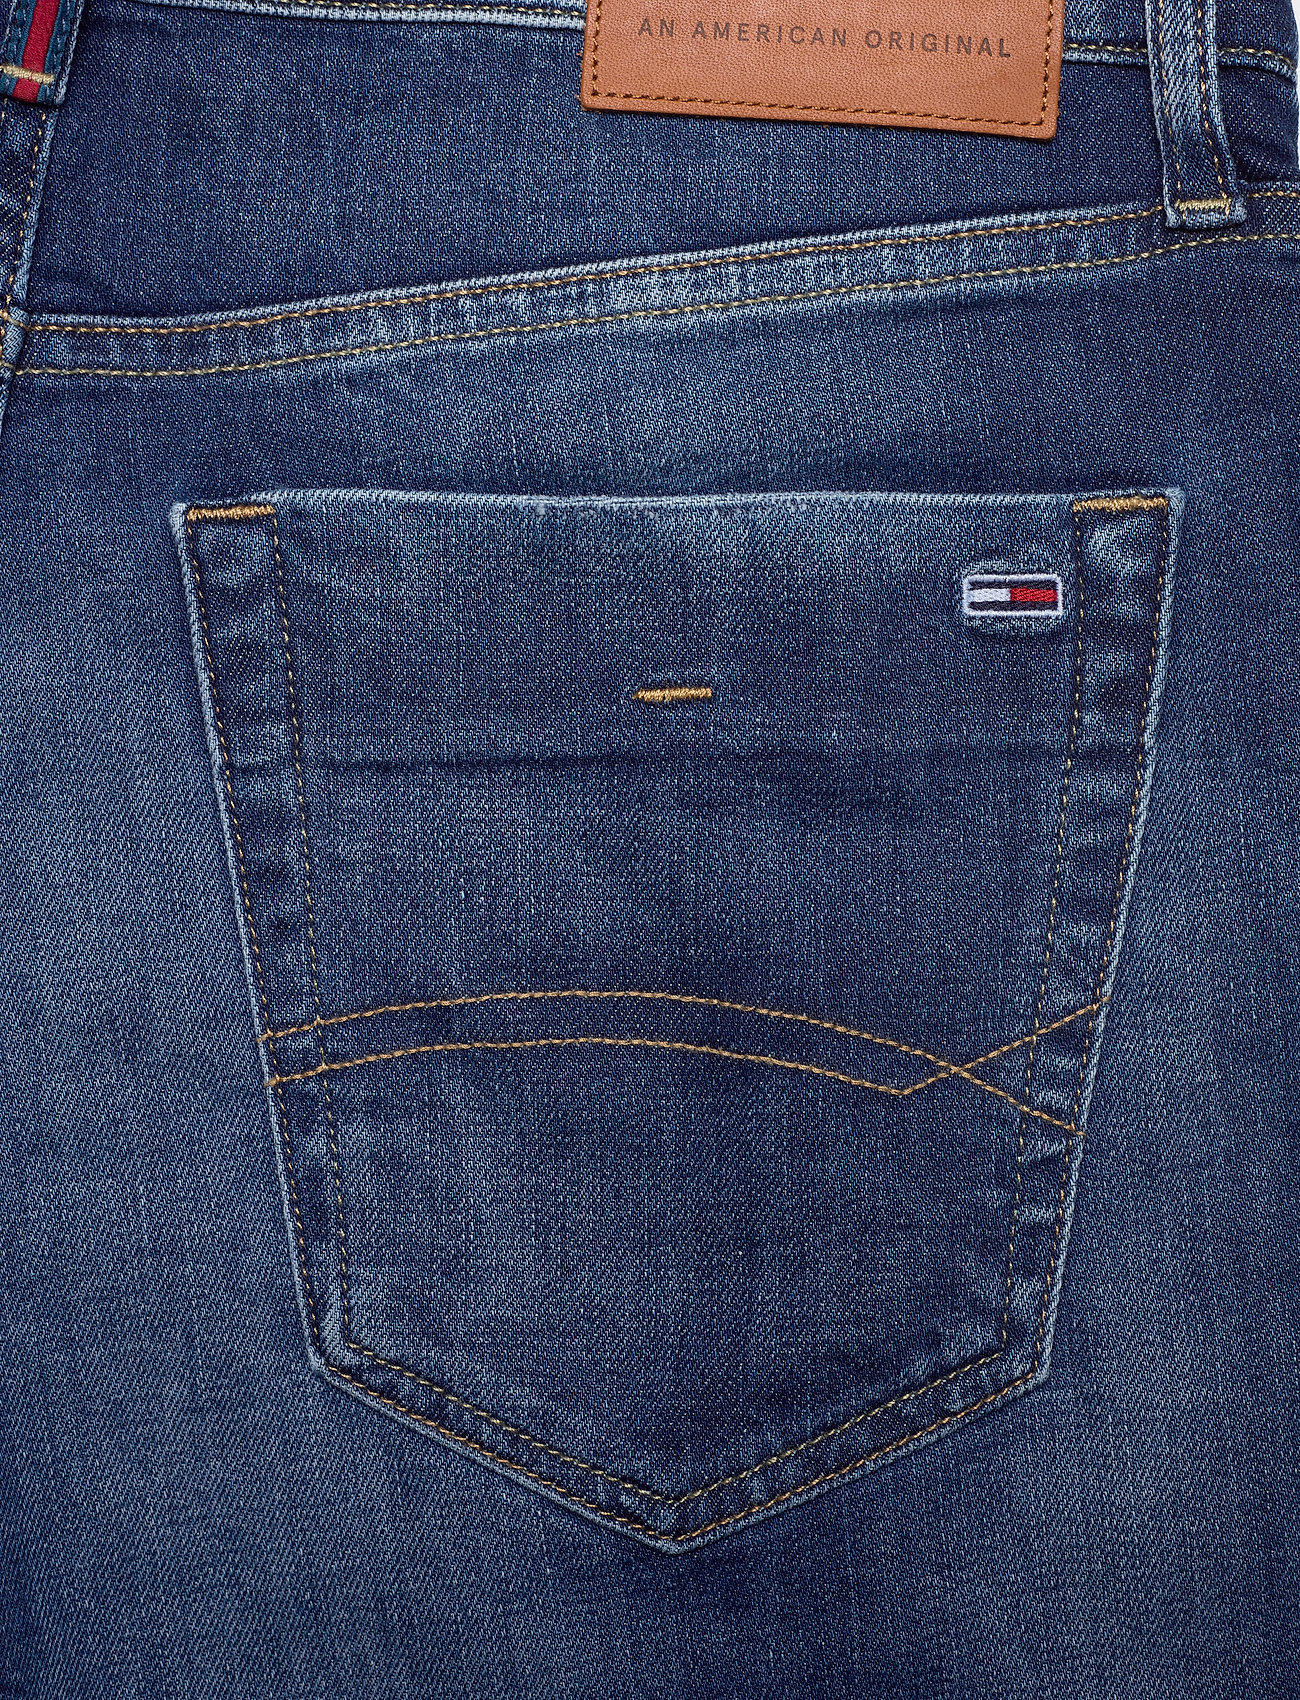 Tommy Jeans Scanton Slim Crbnm - Corbin Mid Bl Str